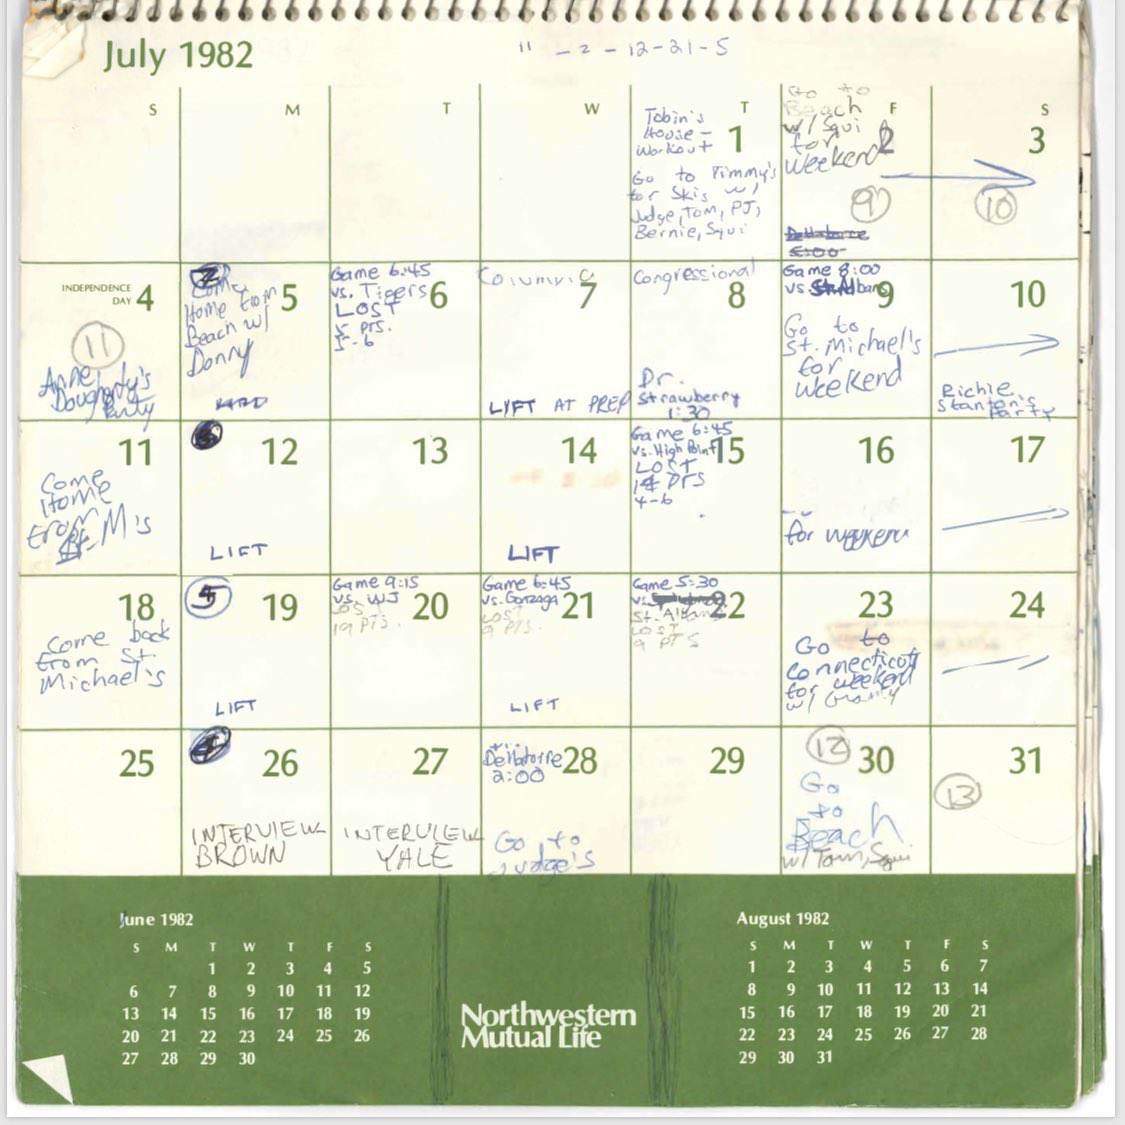 Oh, Seaoat, you there? - Page 6 ?u=https%3A%2F%2Fwww.dailydot.com%2Fwp-content%2Fuploads%2F2018%2F09%2Fbrett-kavanaugh-calendar-july-1982